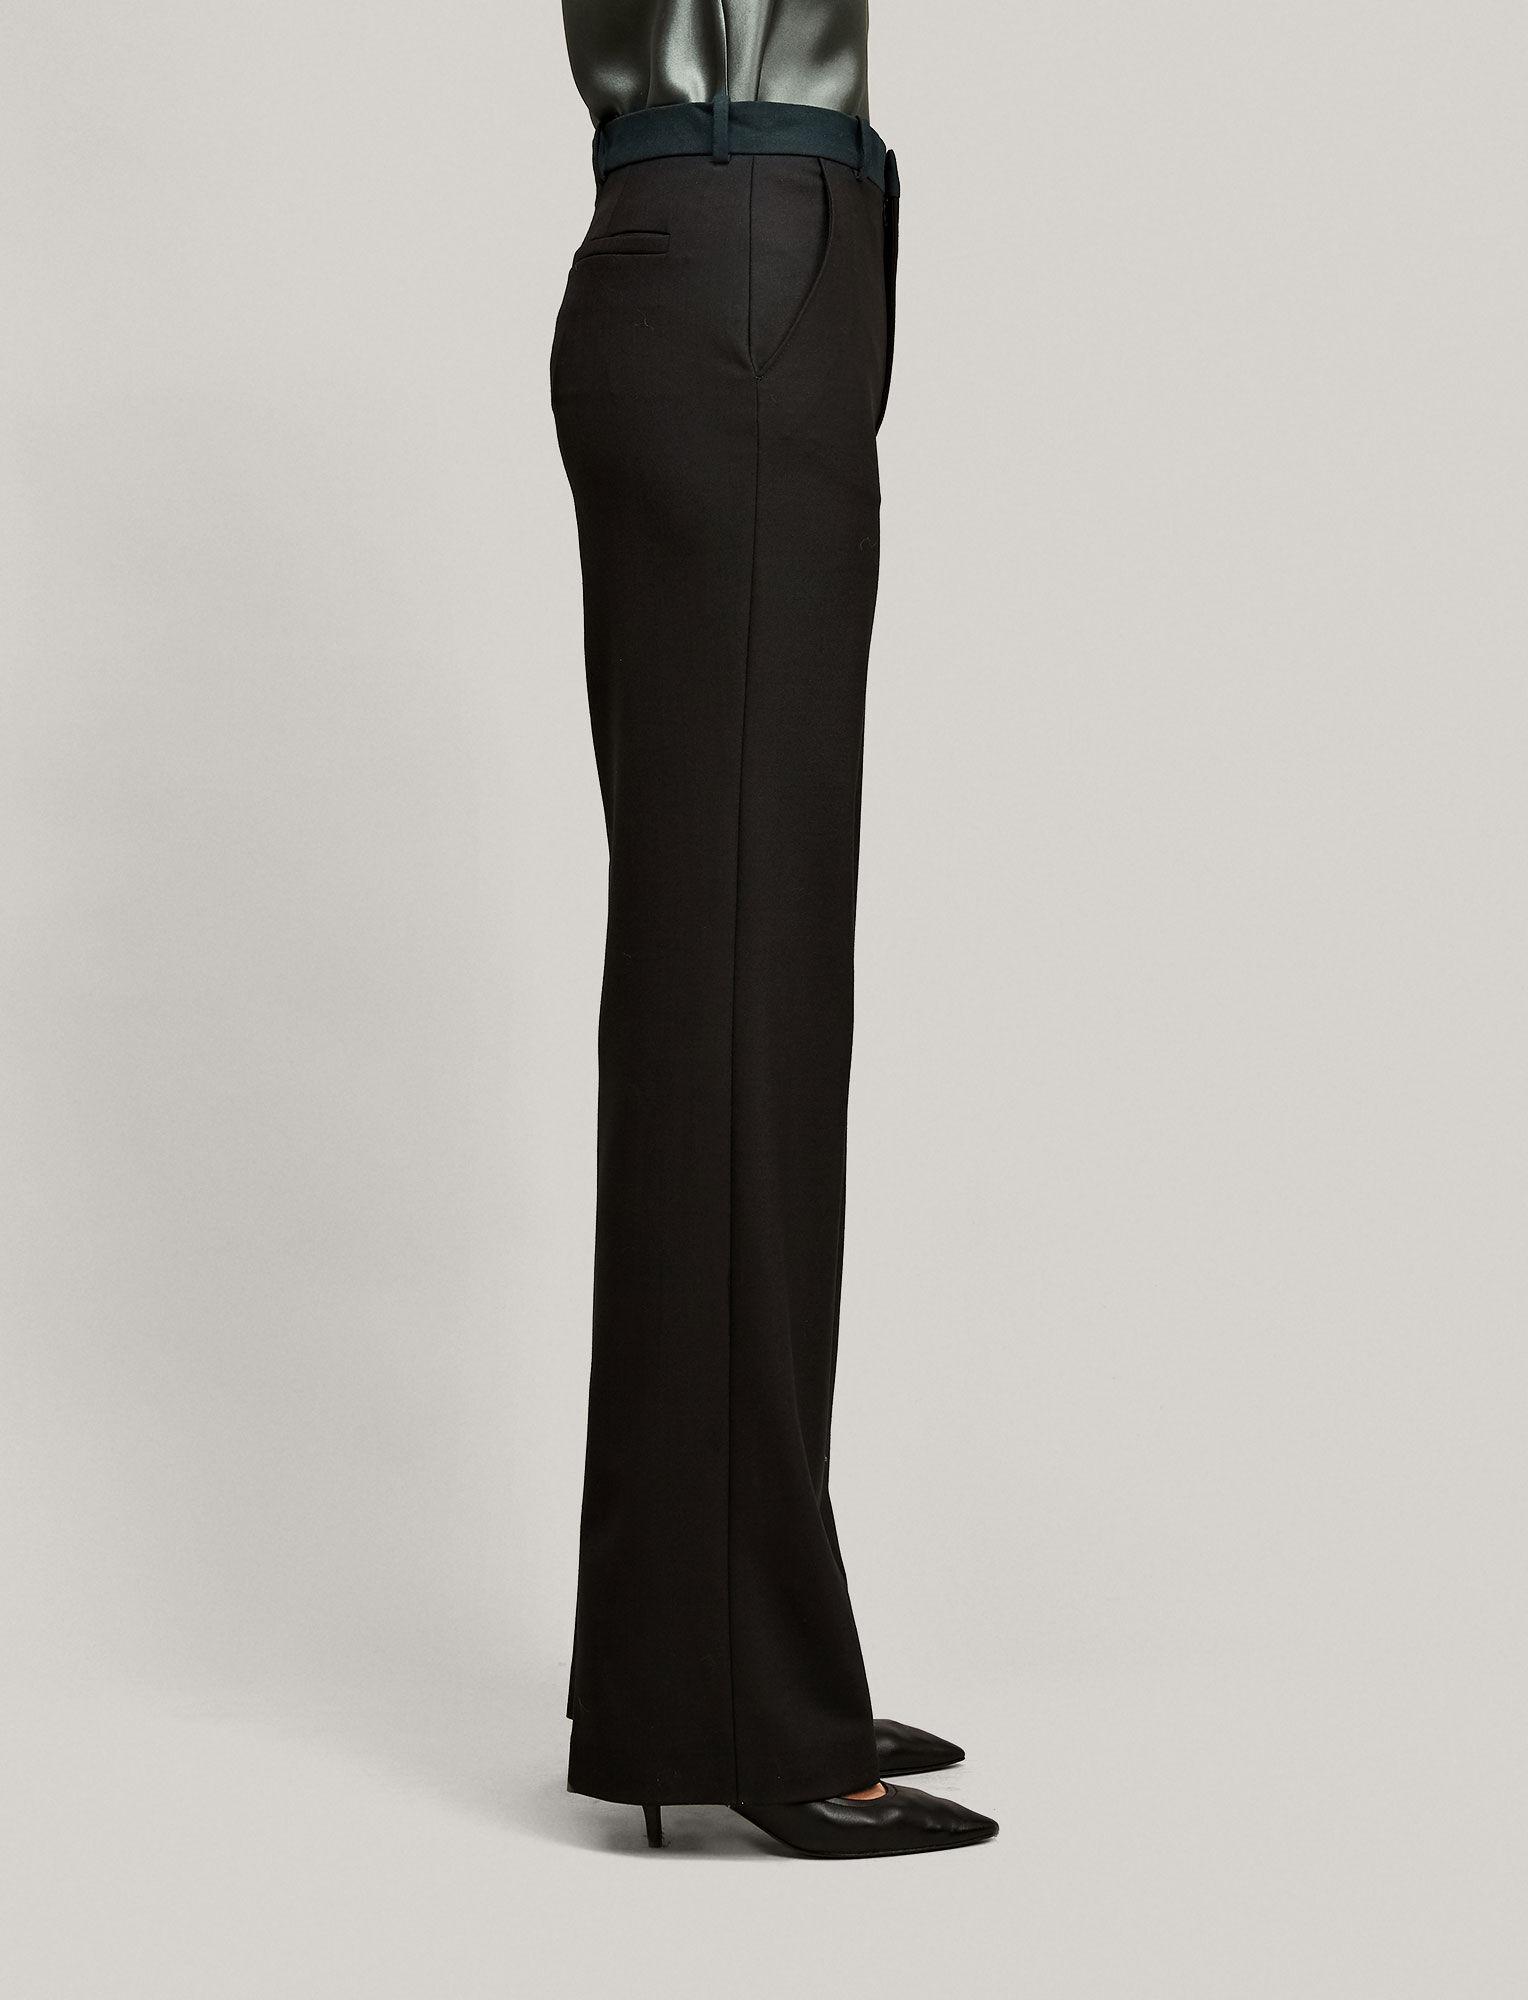 Joseph, New Tropez Comfort Wool Trousers, in BLACK